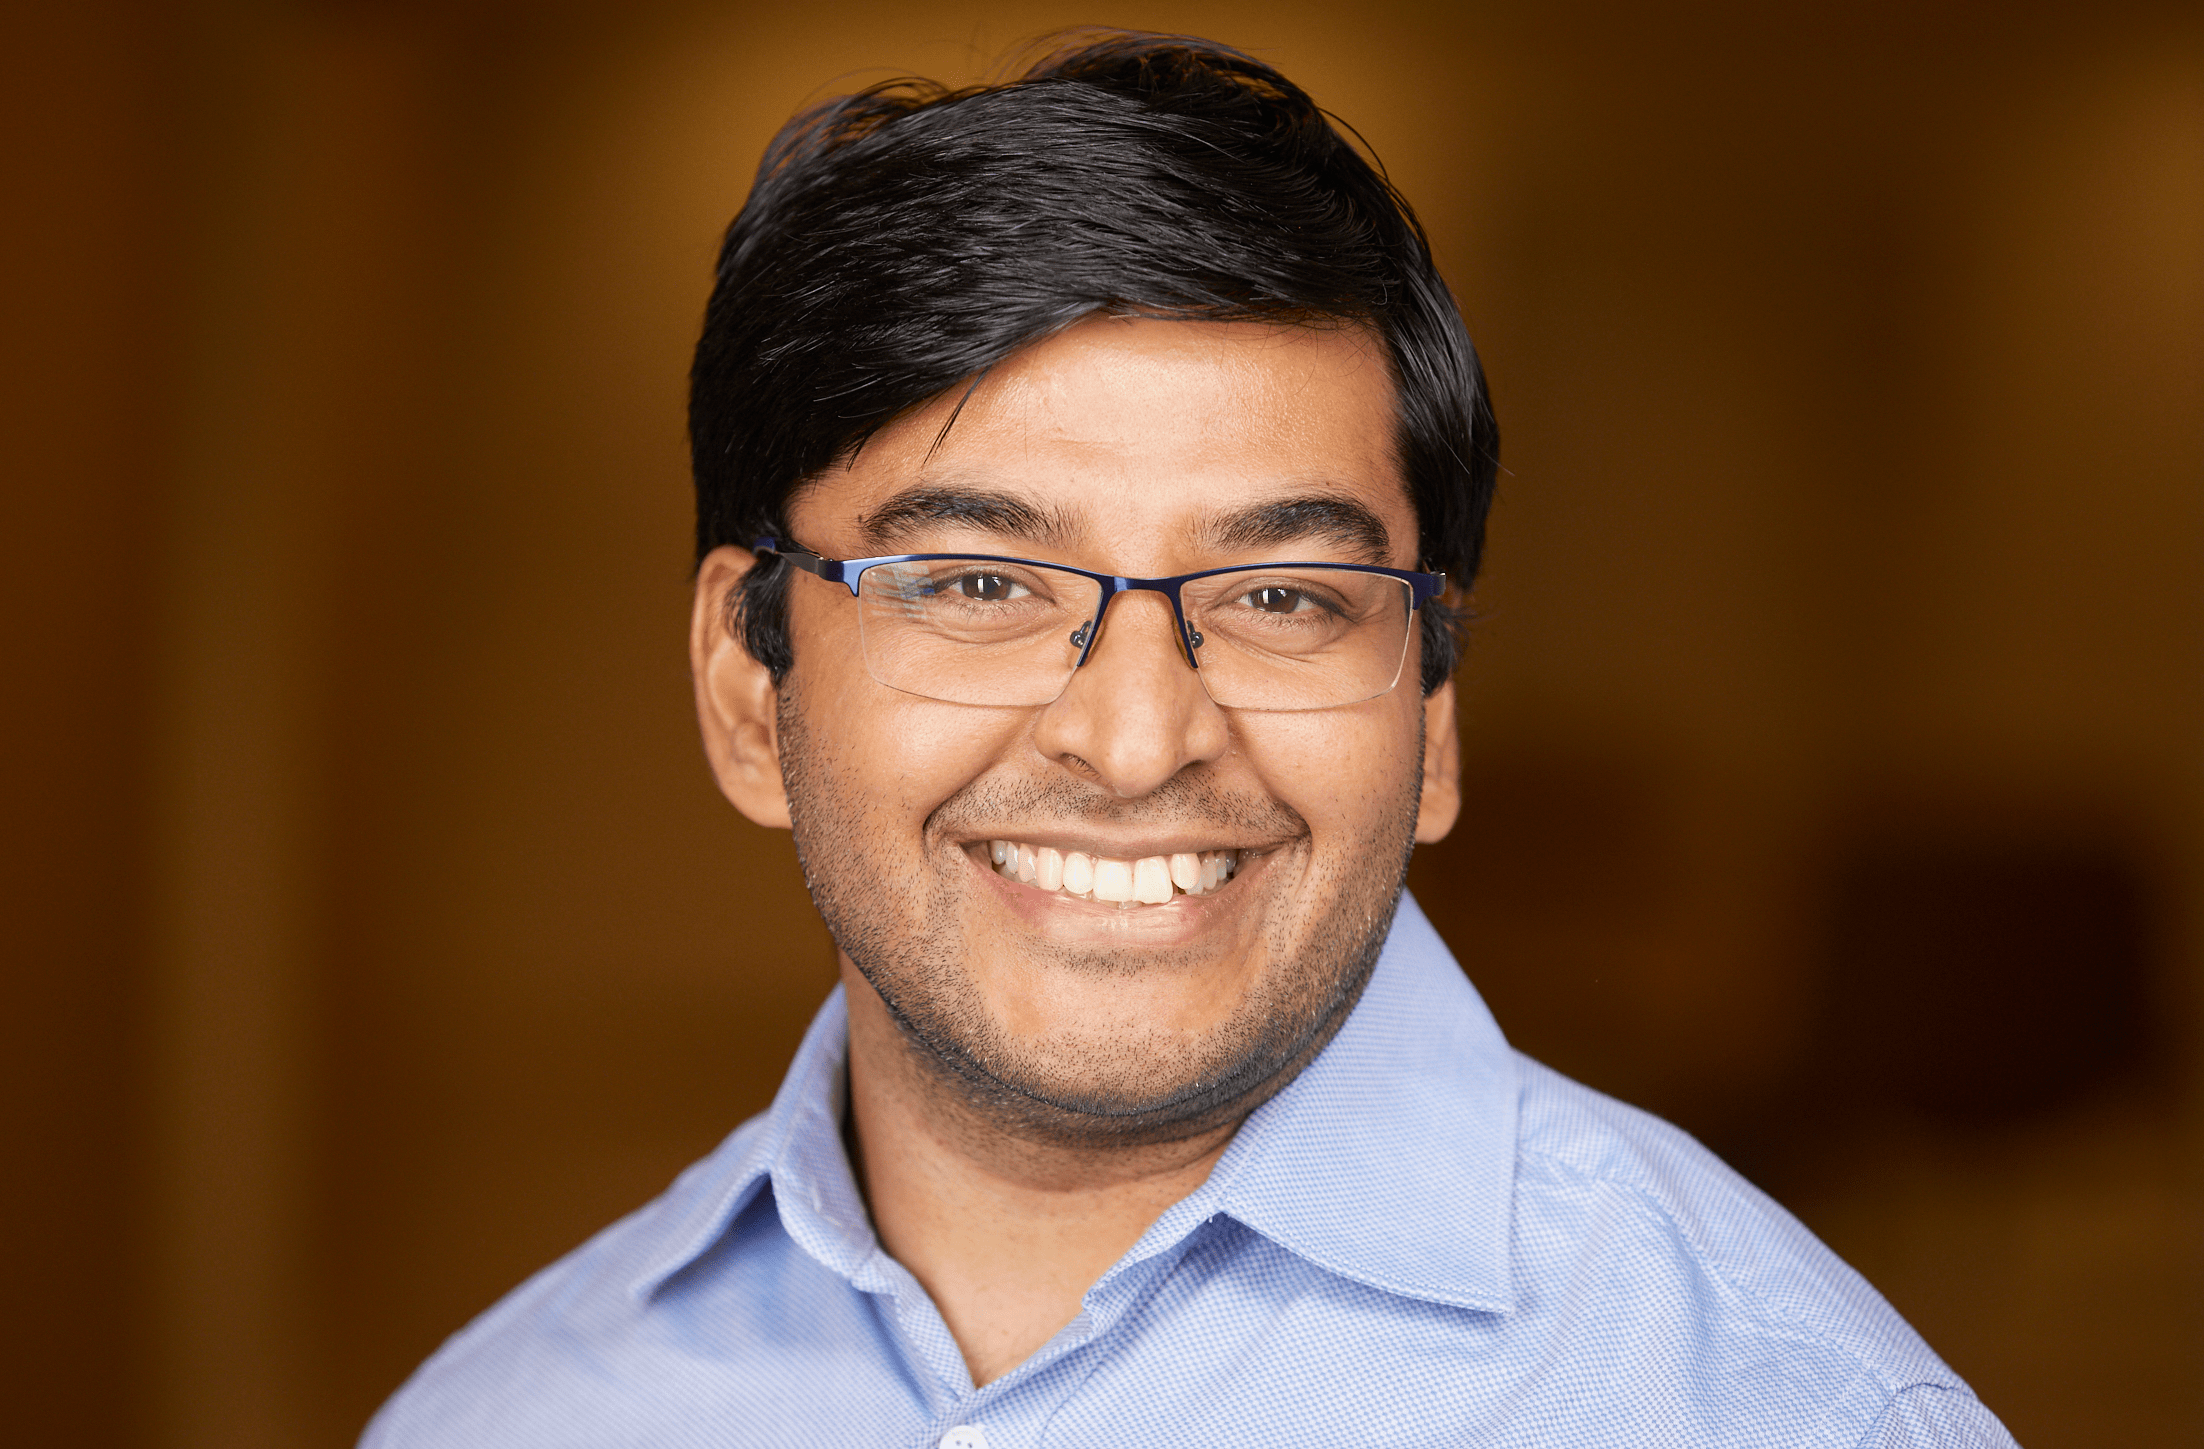 Gaurav Tripathi, Co-founder / CEO, Superpro.ai